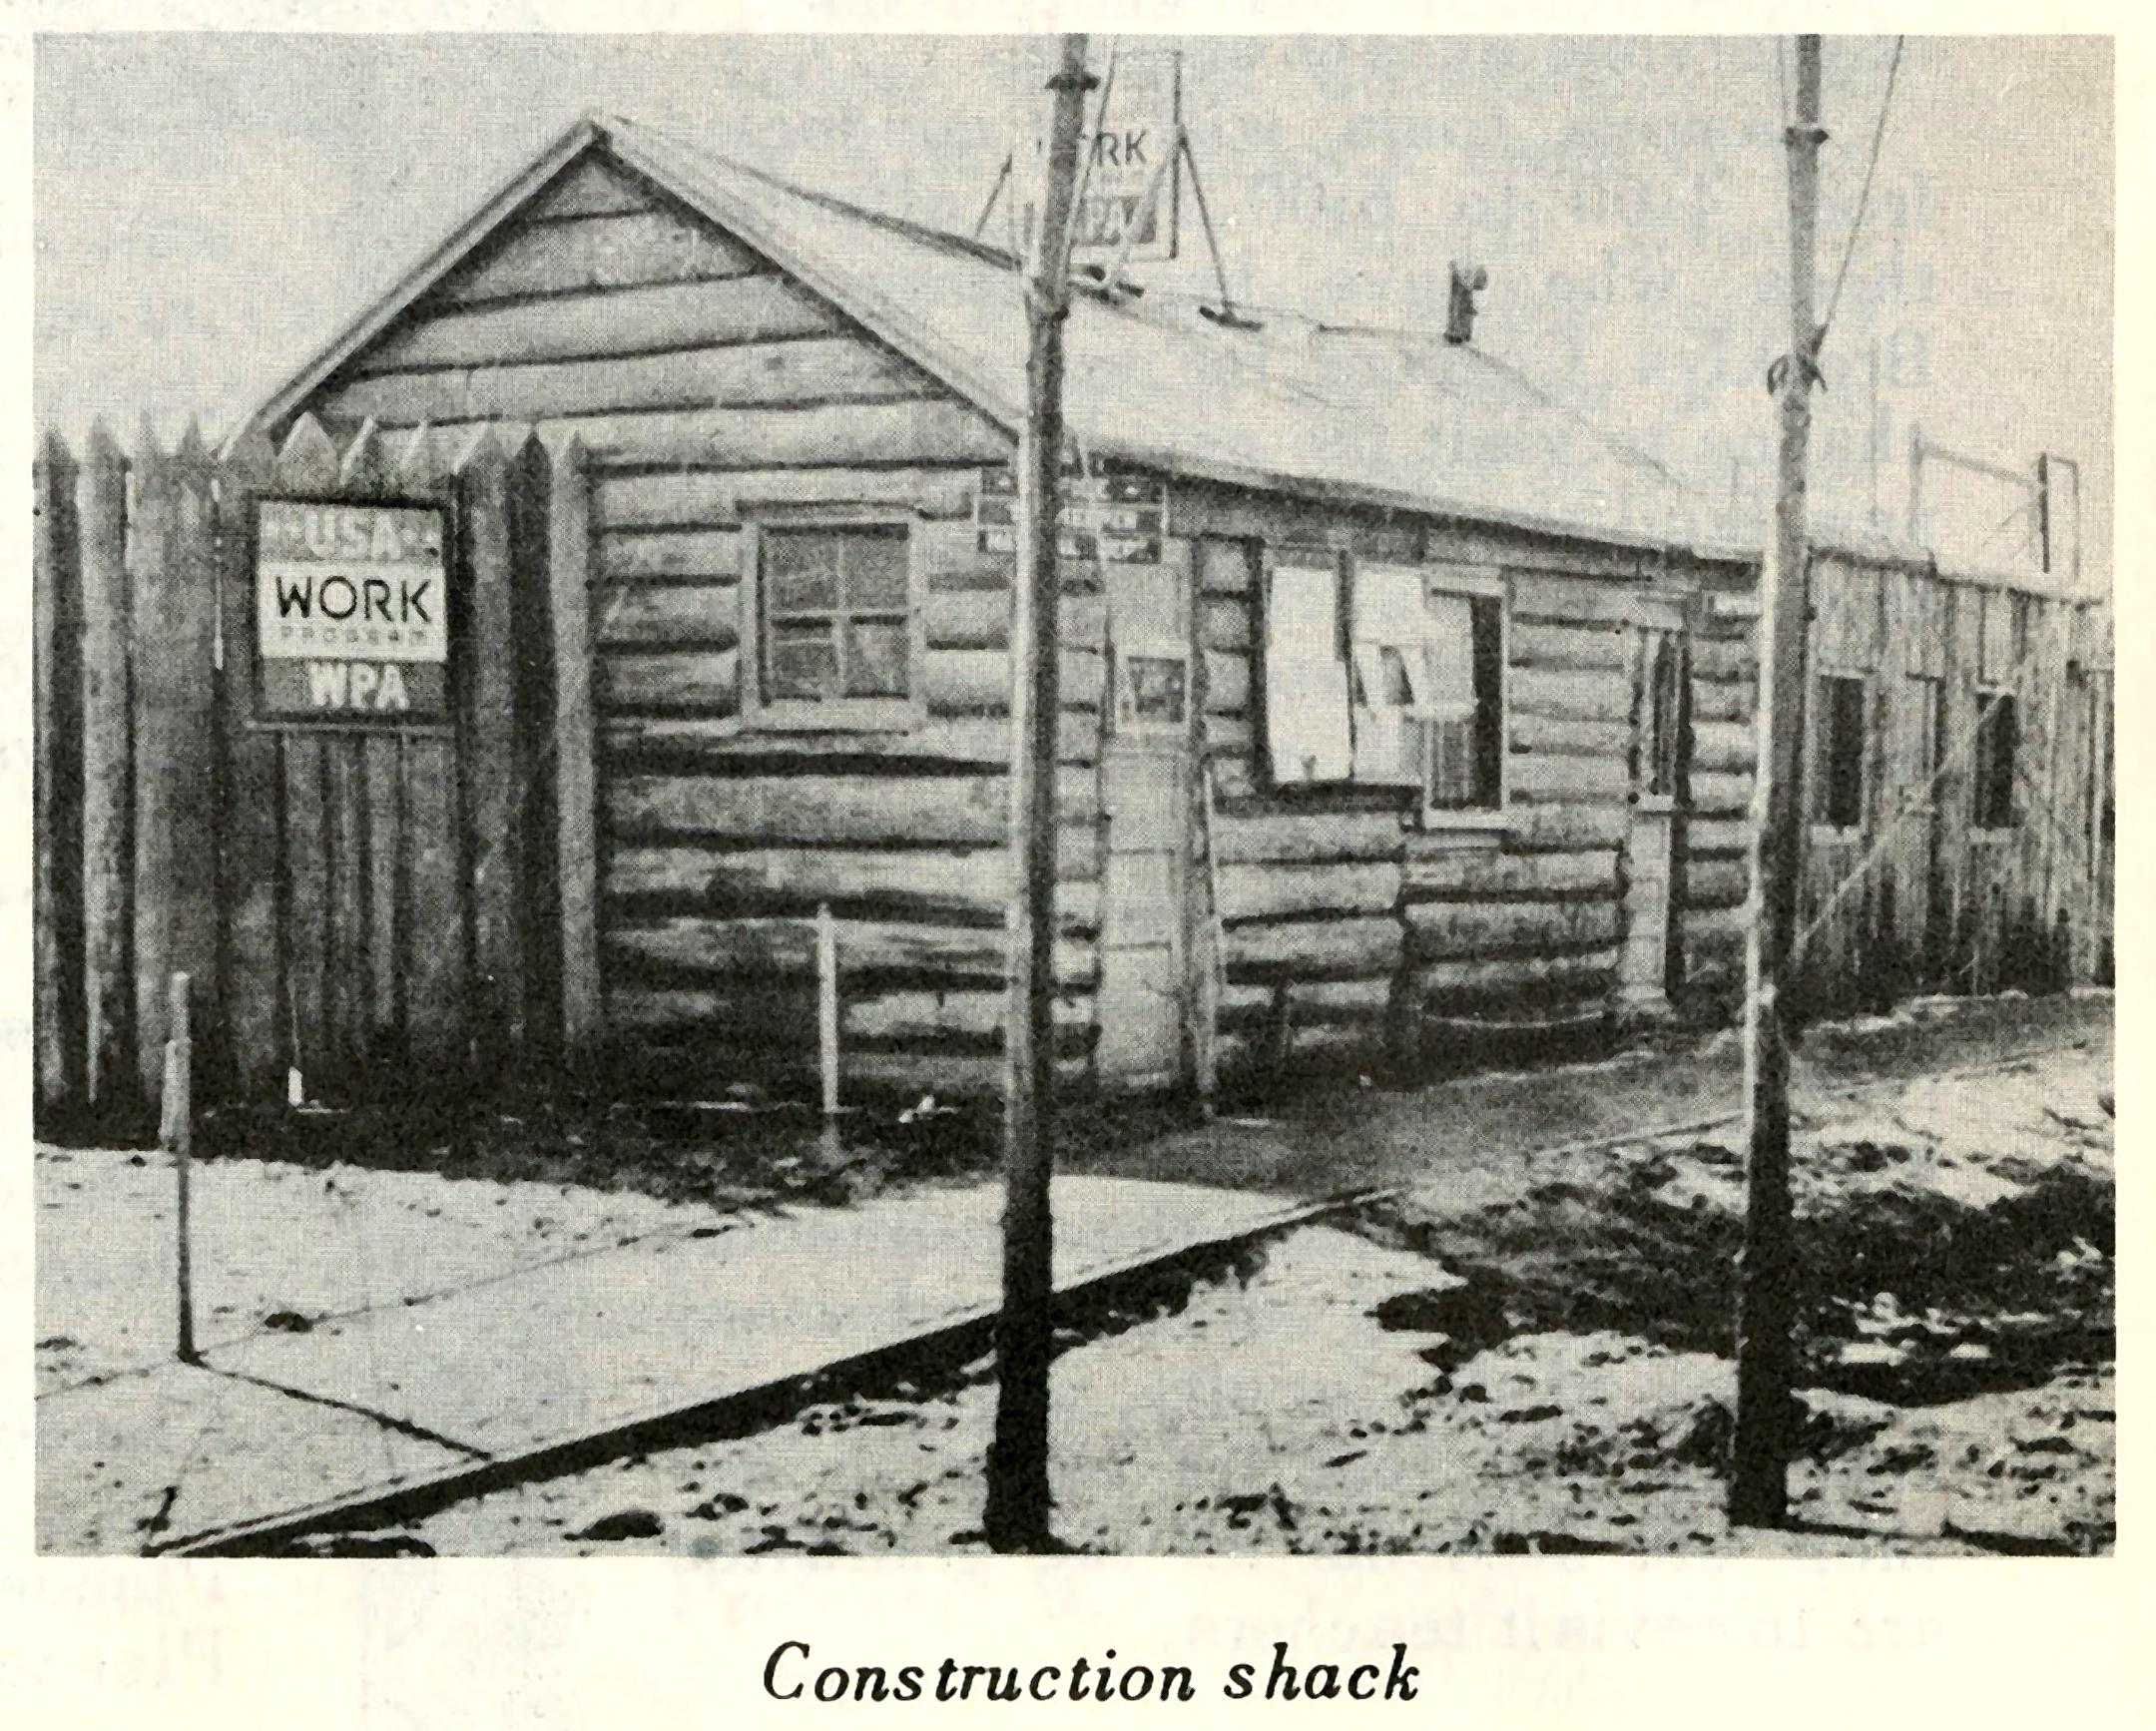 Brooklyn College Construction Shack, 1936